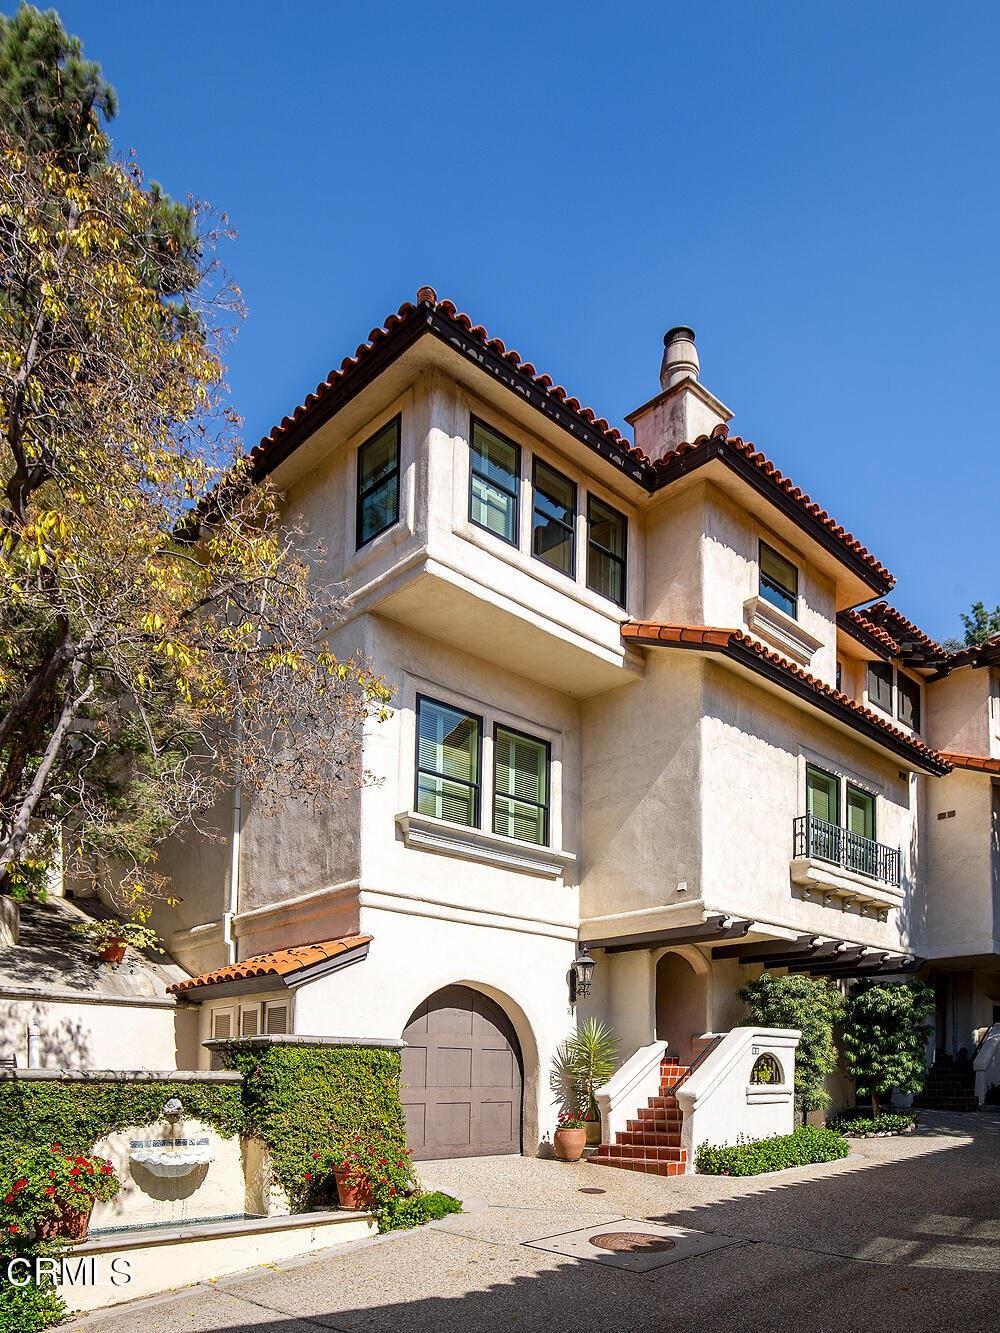 Photo of 66 N Arroyo Boulevard, Pasadena, CA 91105 (MLS # P1-6843)